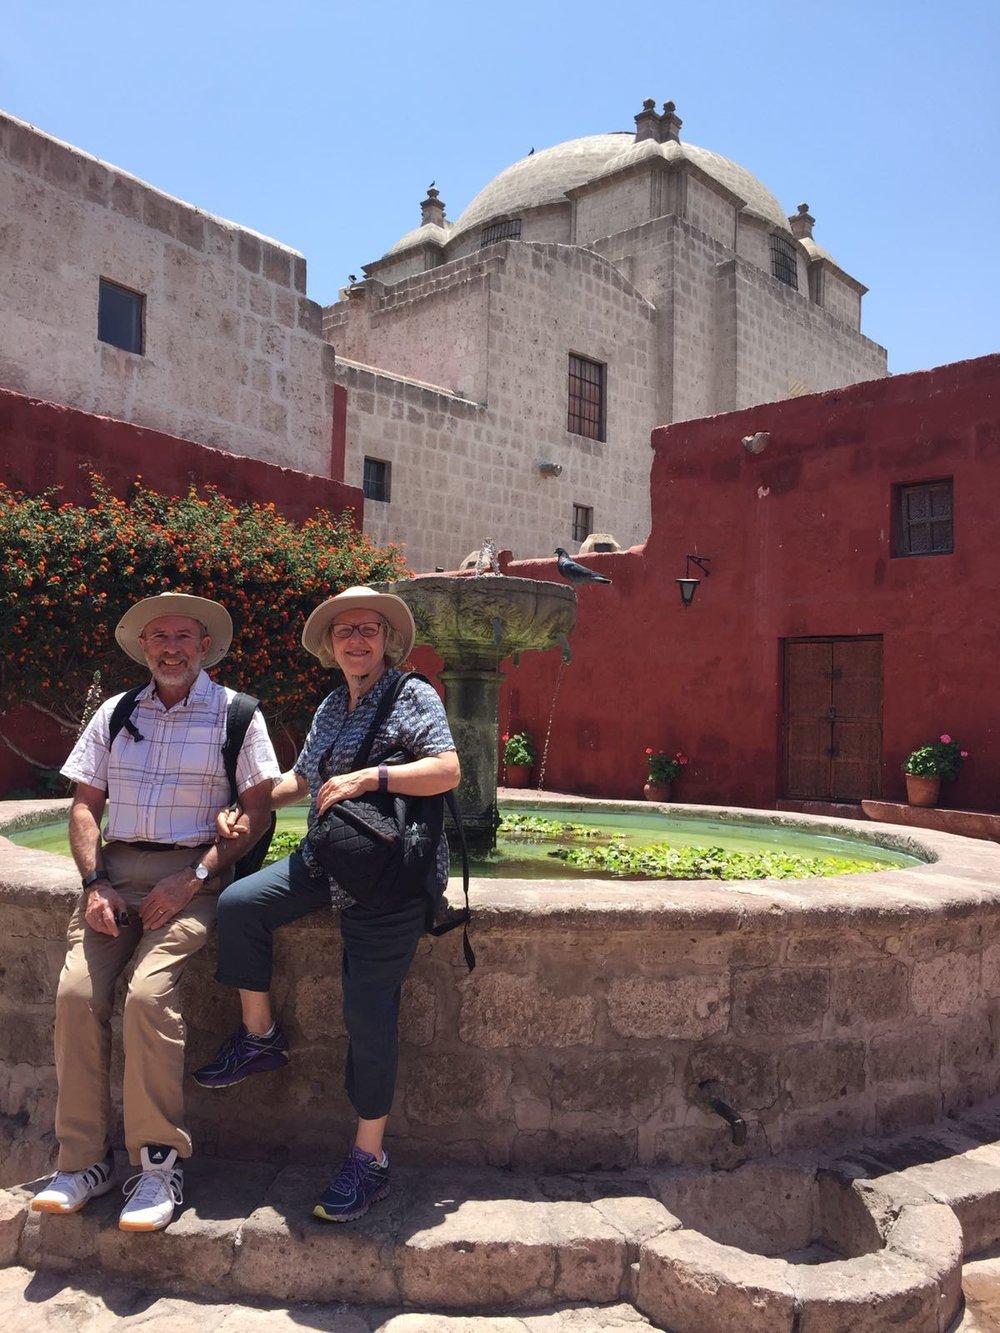 Dallas, Elana x 2 - Arequipa & Colca - Santa Catalina Monastery.jpg